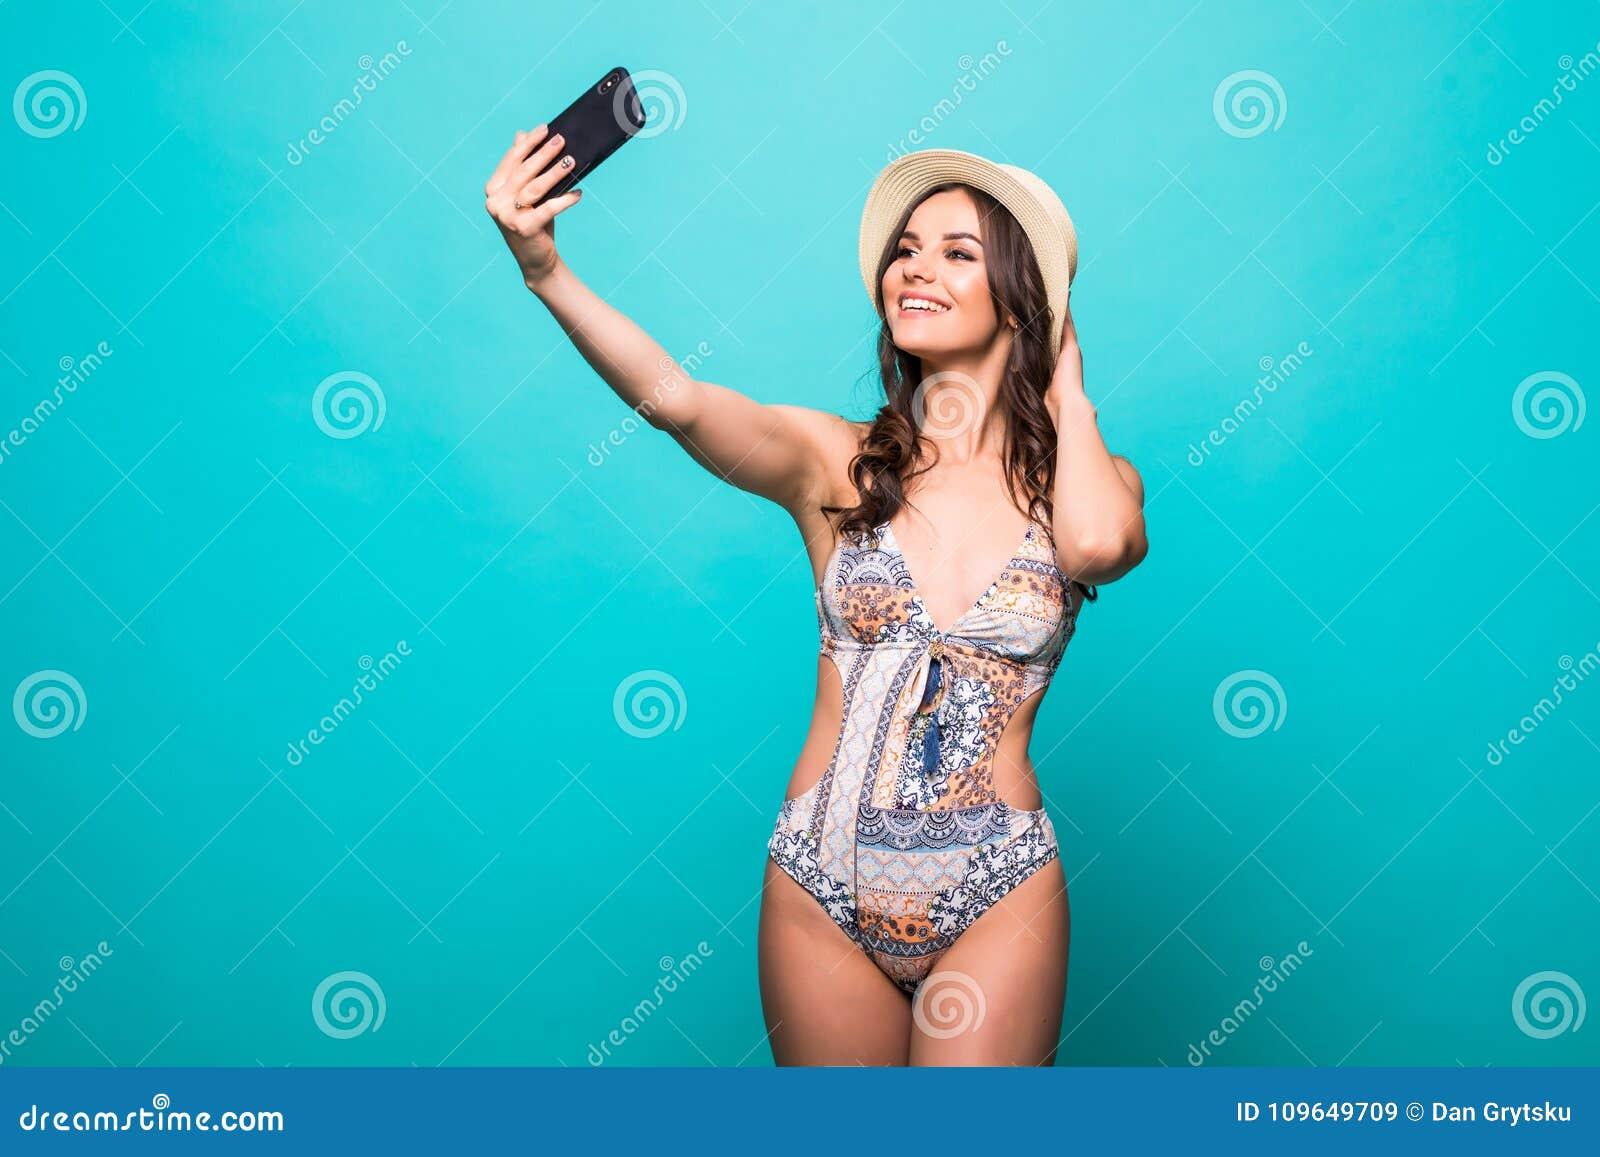 amateur girl selfie